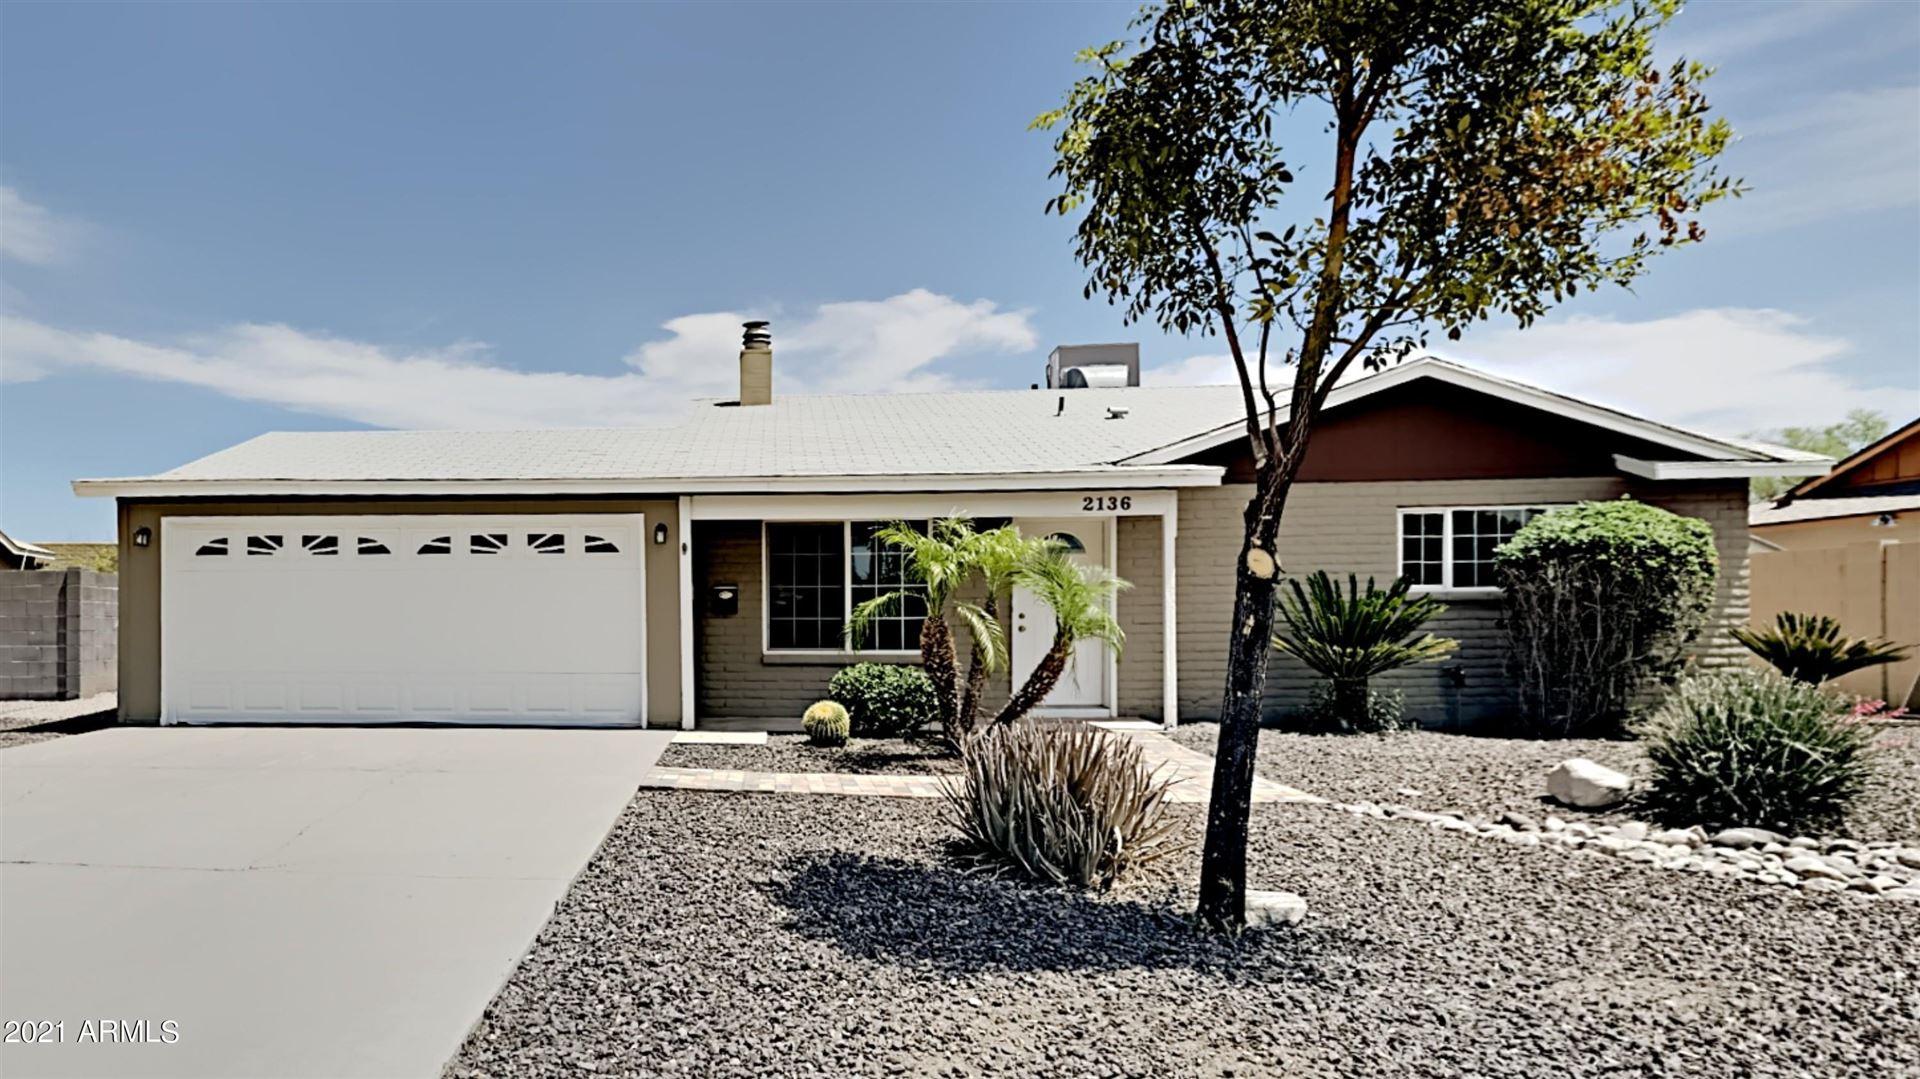 2136 E GREENWAY Drive, Tempe, AZ 85282 - MLS#: 6232246